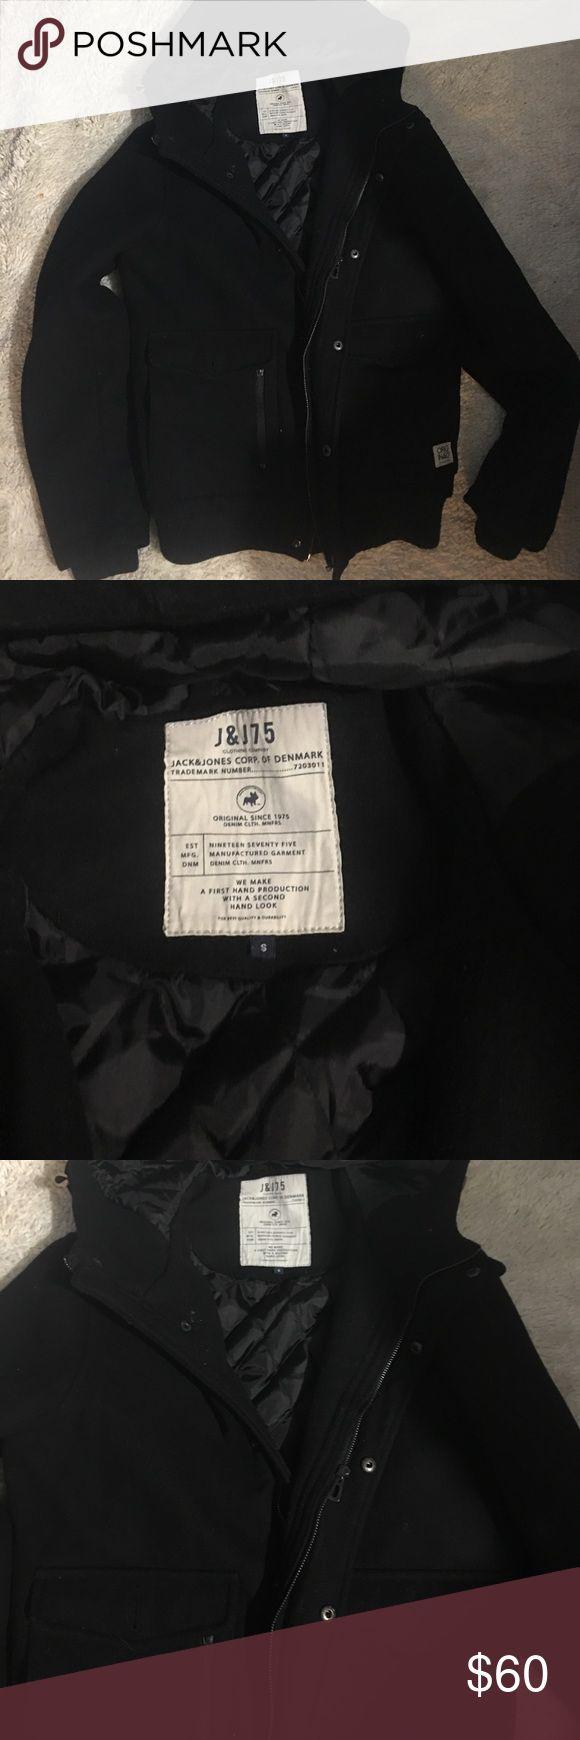 Jack and Jones wool coat S Great condition and so warm Jack and Jones Jackets & Coats